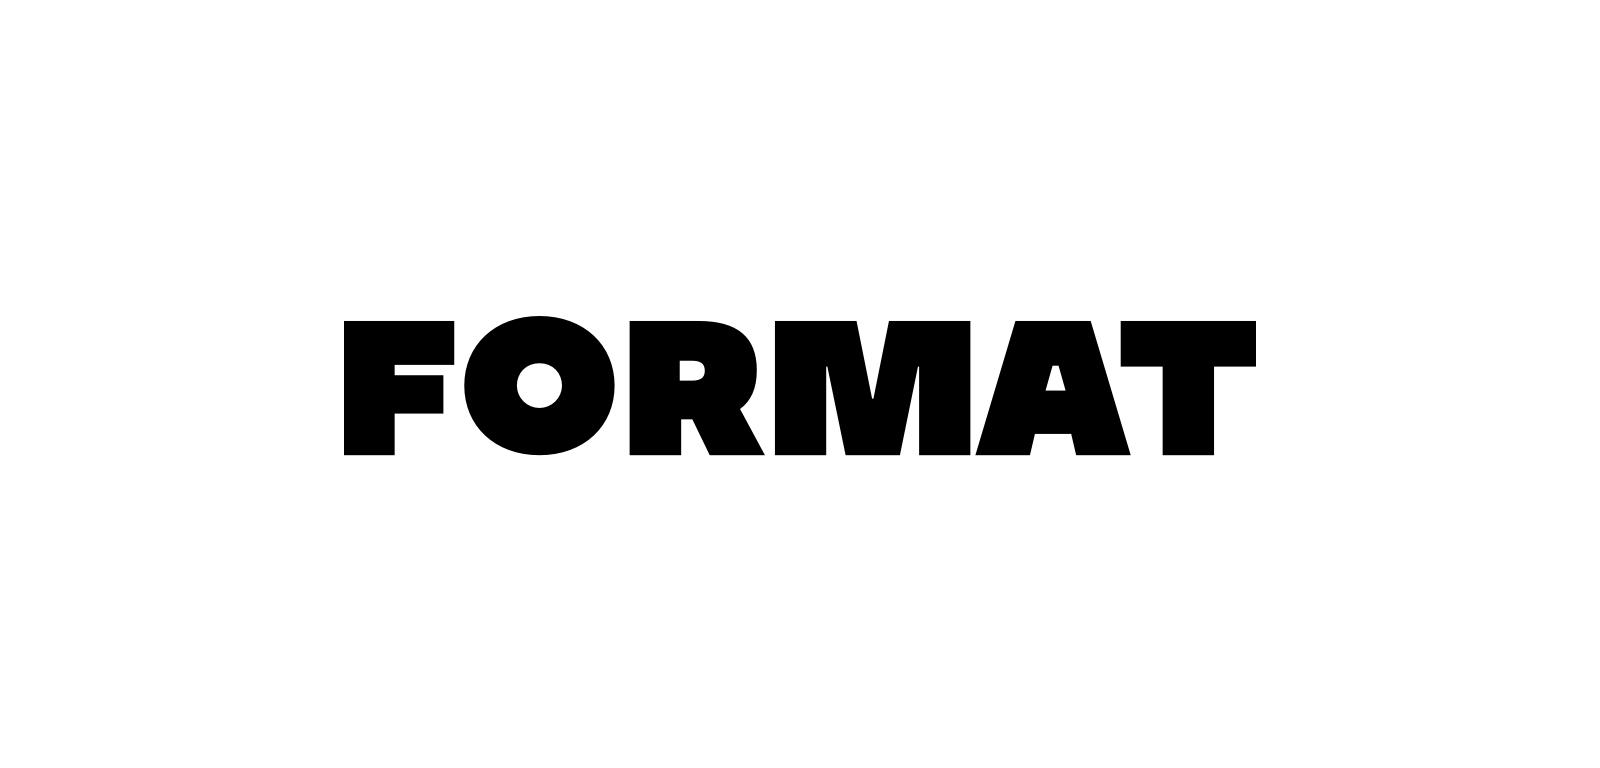 format white wordmark